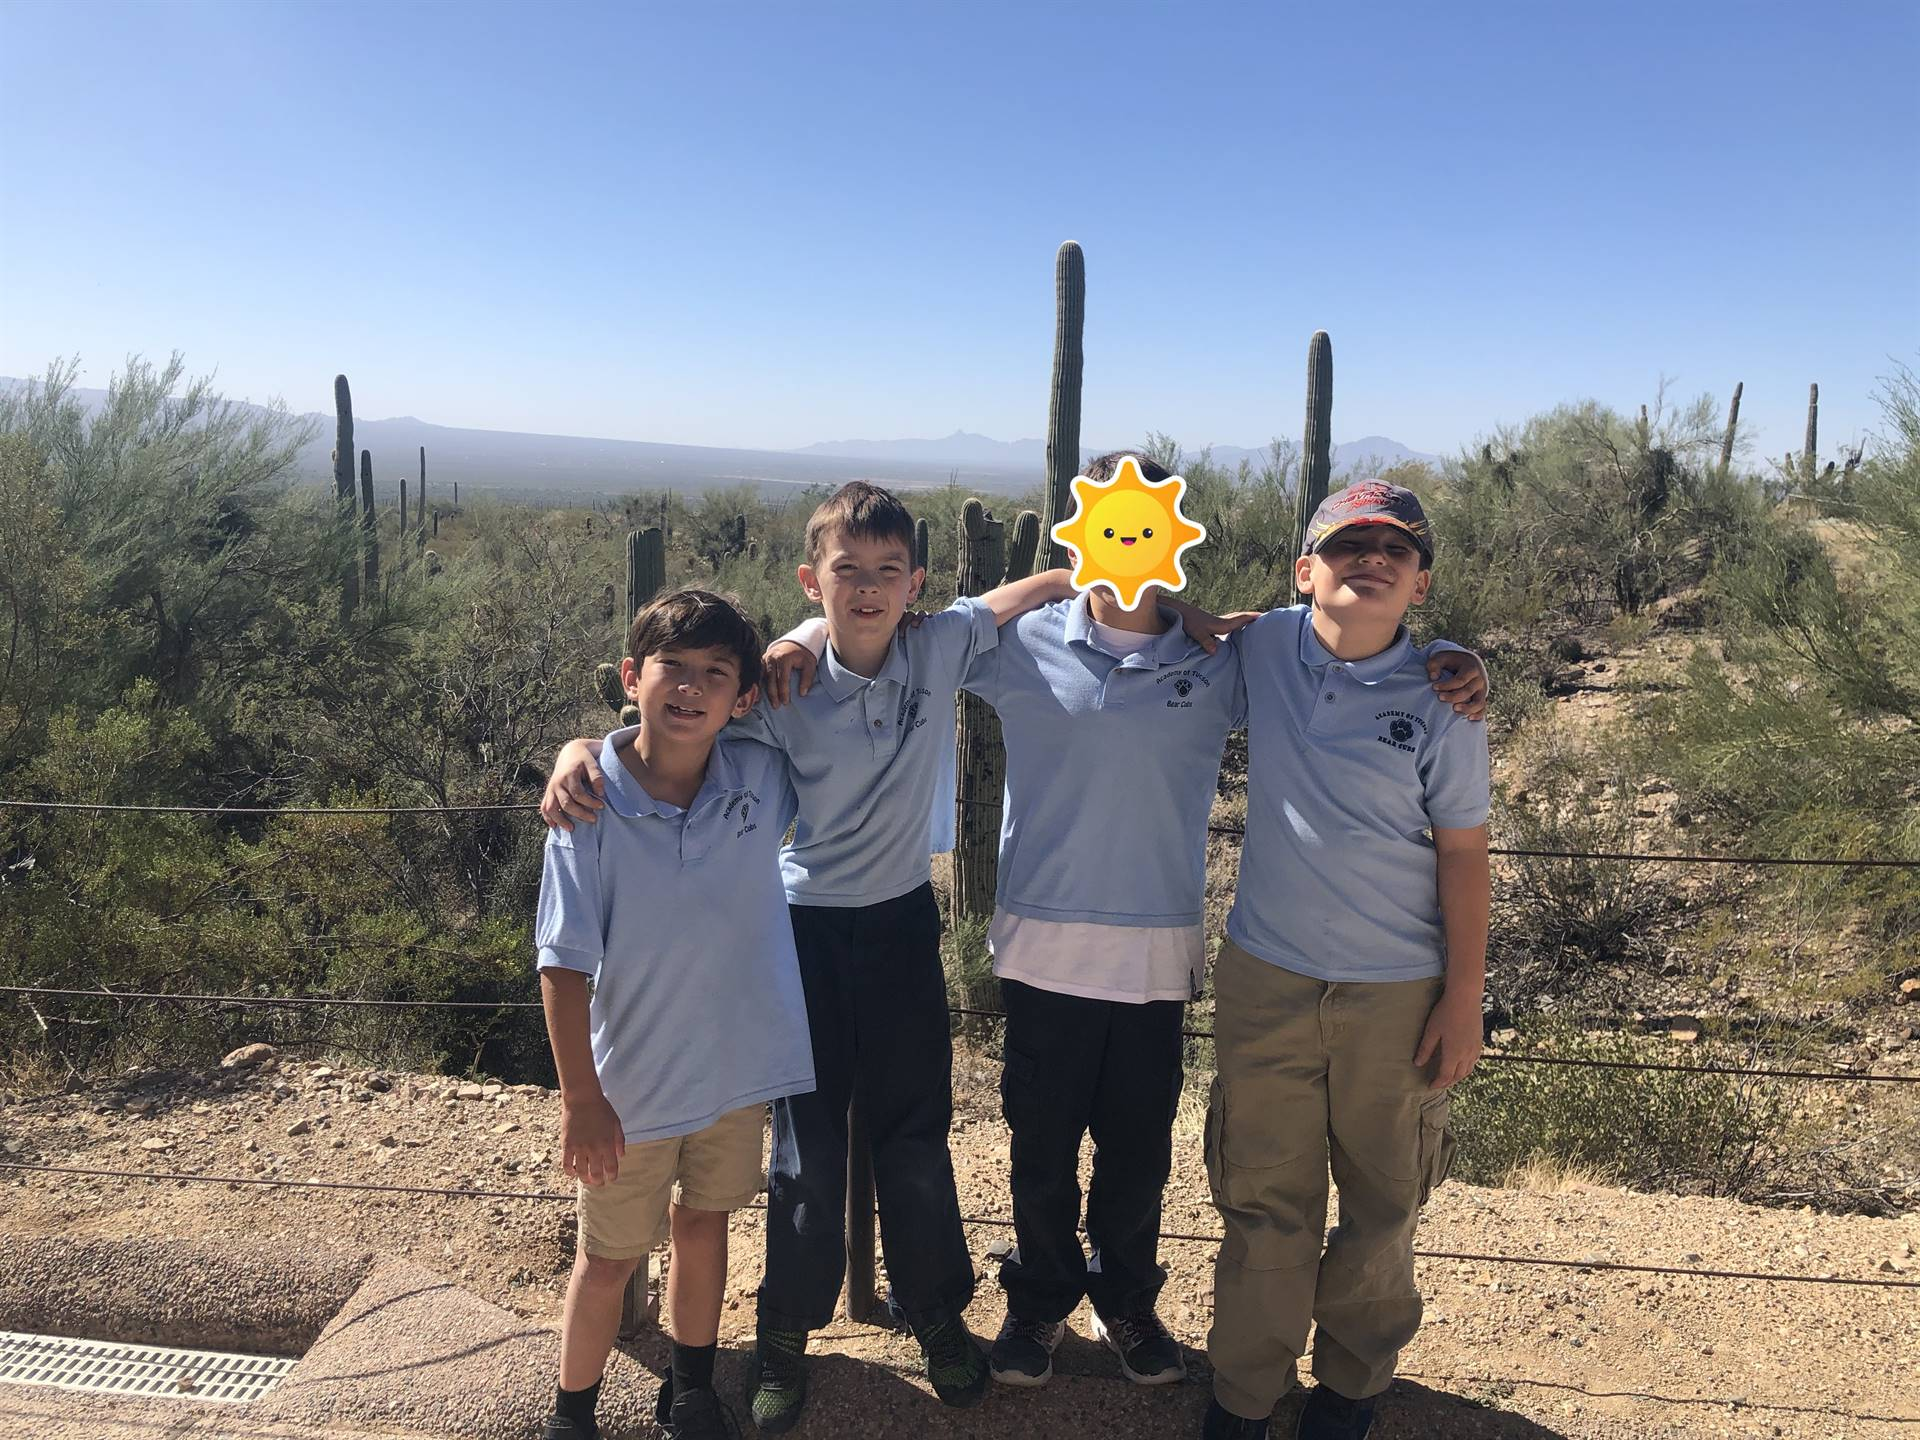 students pose in front of desert landscape